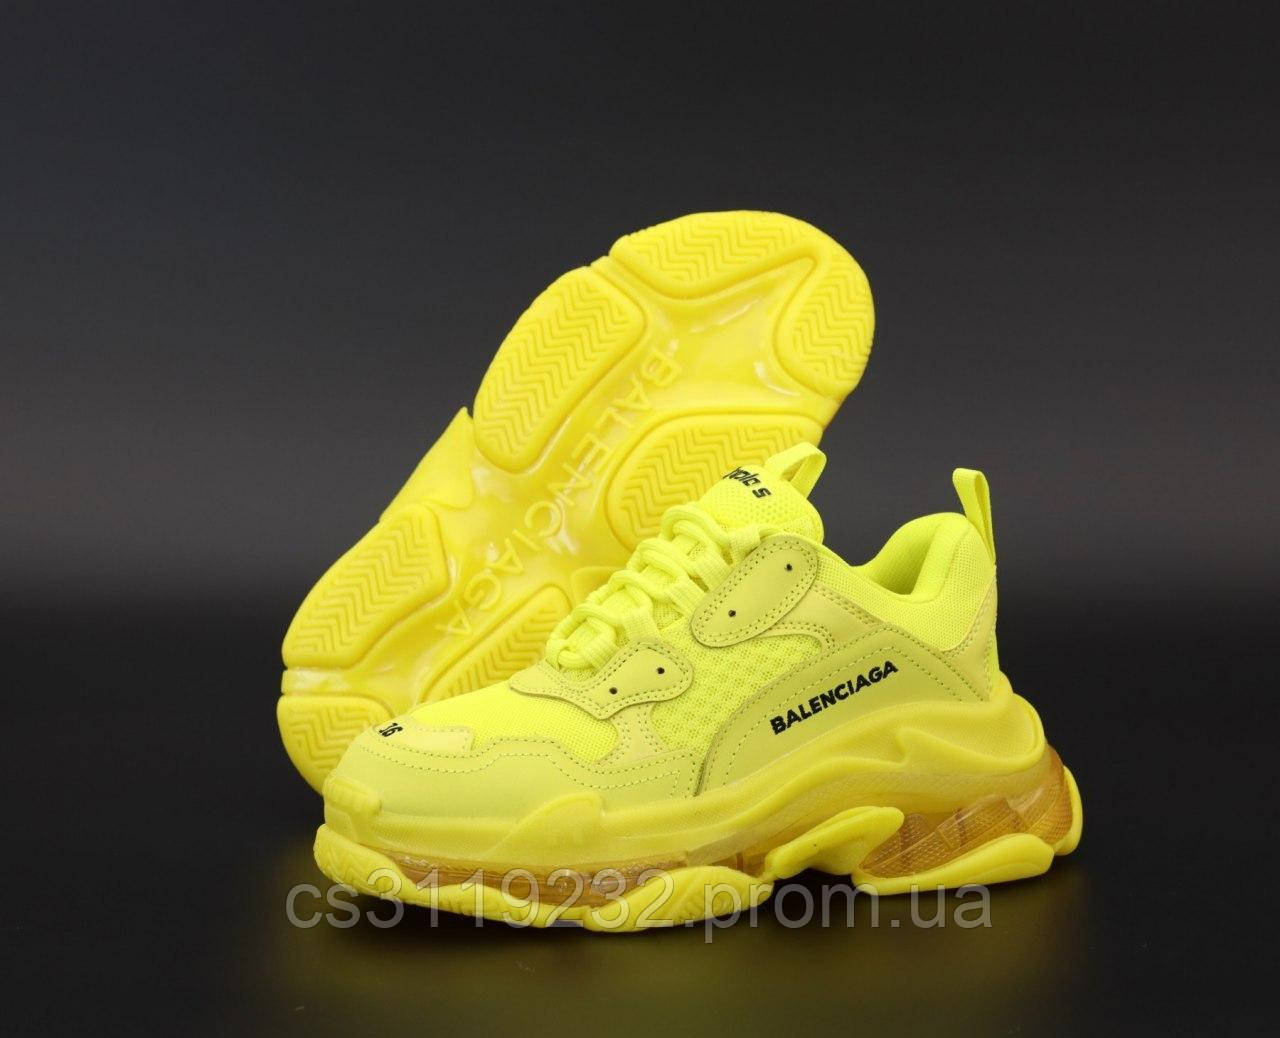 Женские кроссовки Balenciaga Triple S Full Yellow (желтый)